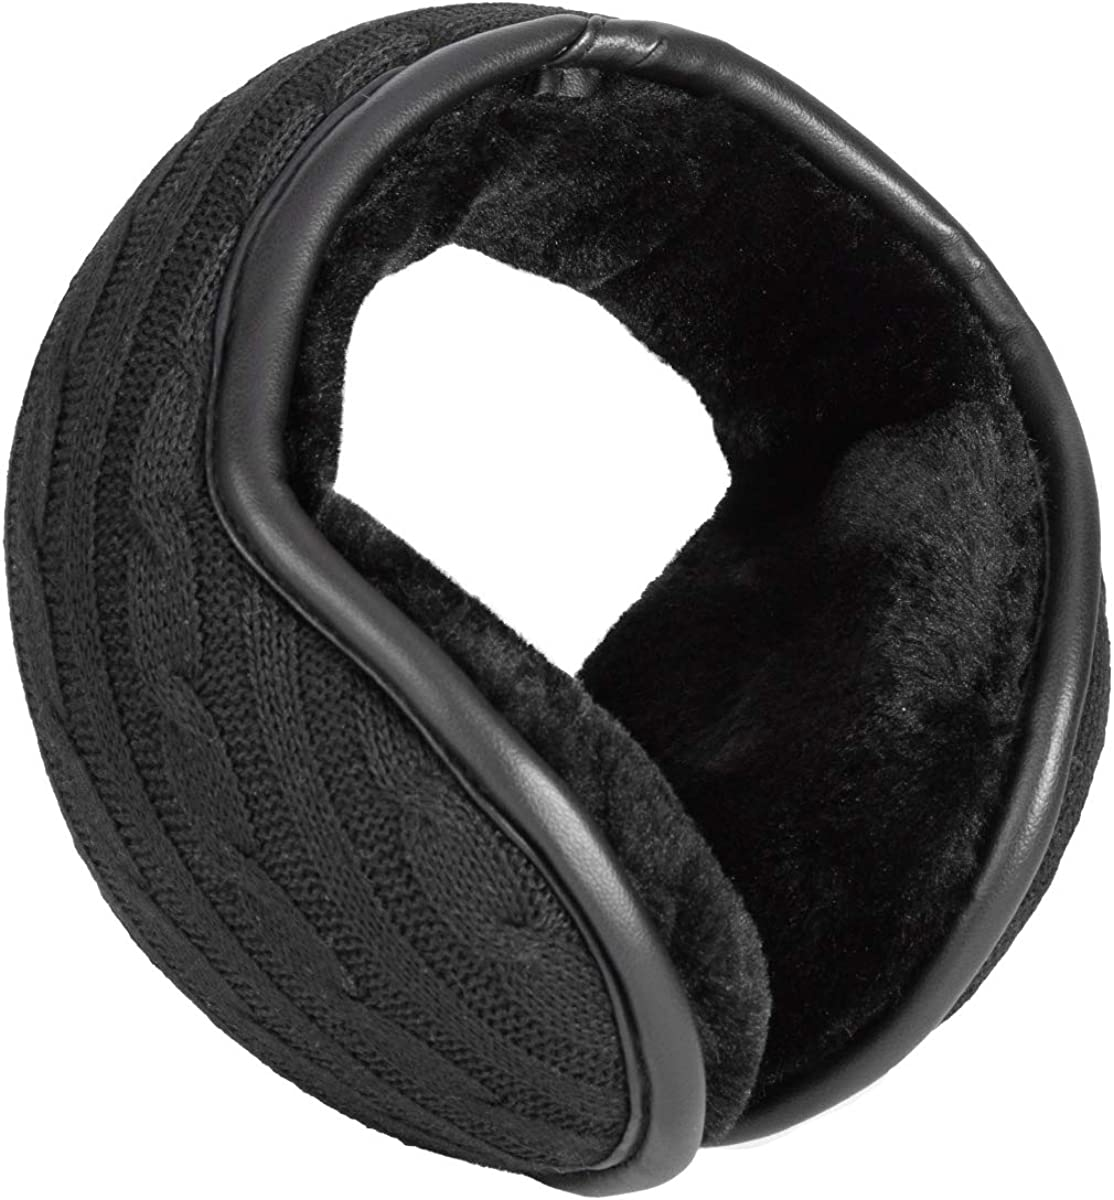 NCONCO Earmuffs for Women Girls Winter Ear Warmer Warm Furry Ear Muffs Ear Covers